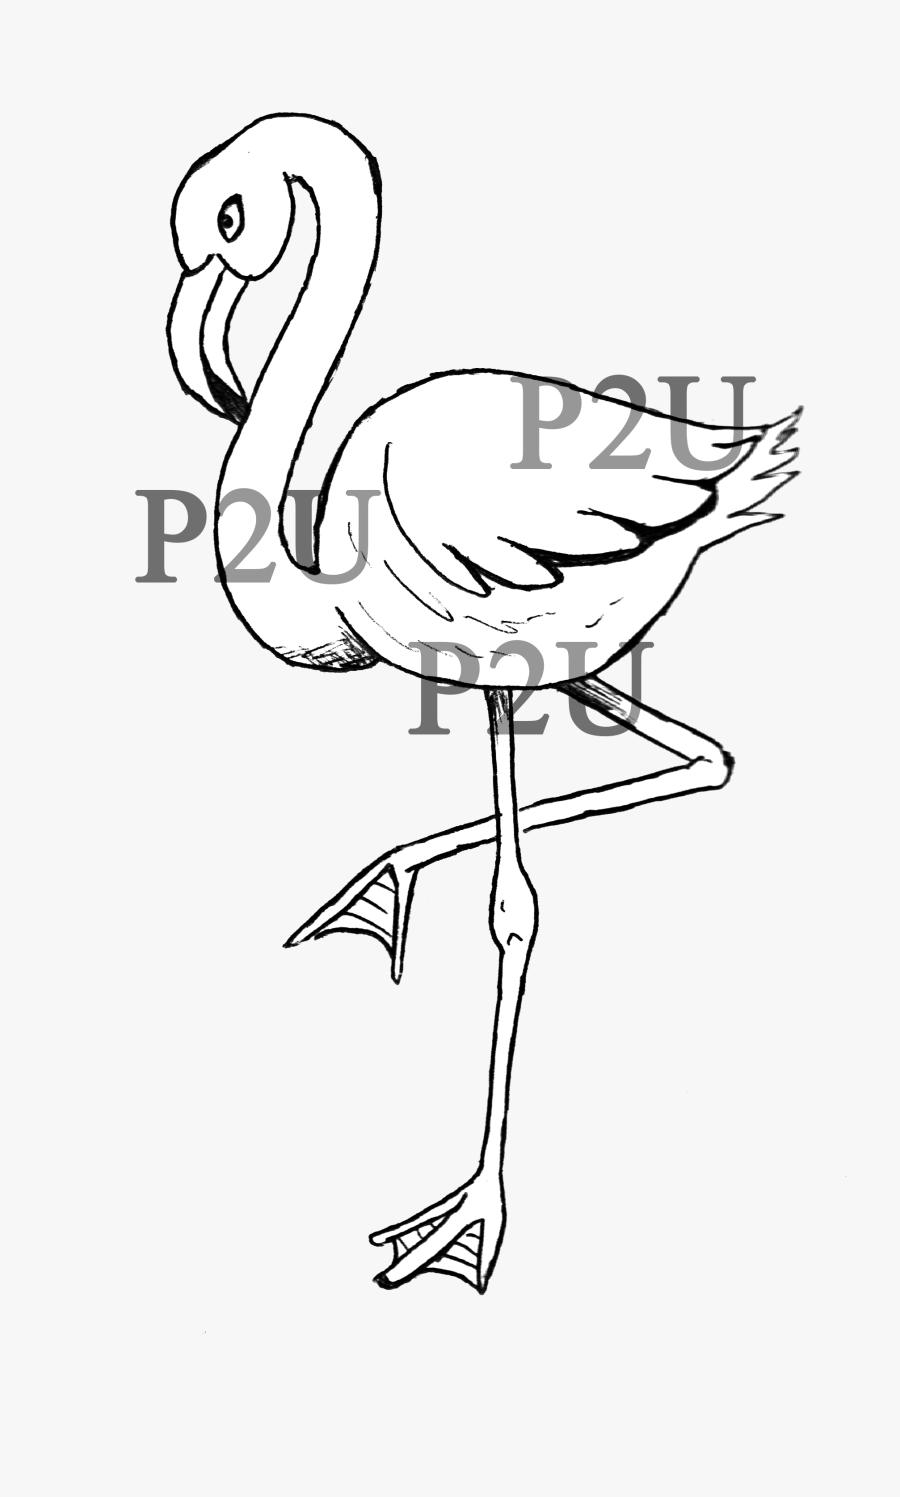 Clip Art Flamingo Line Art - Flamingo Lineart, Transparent Clipart